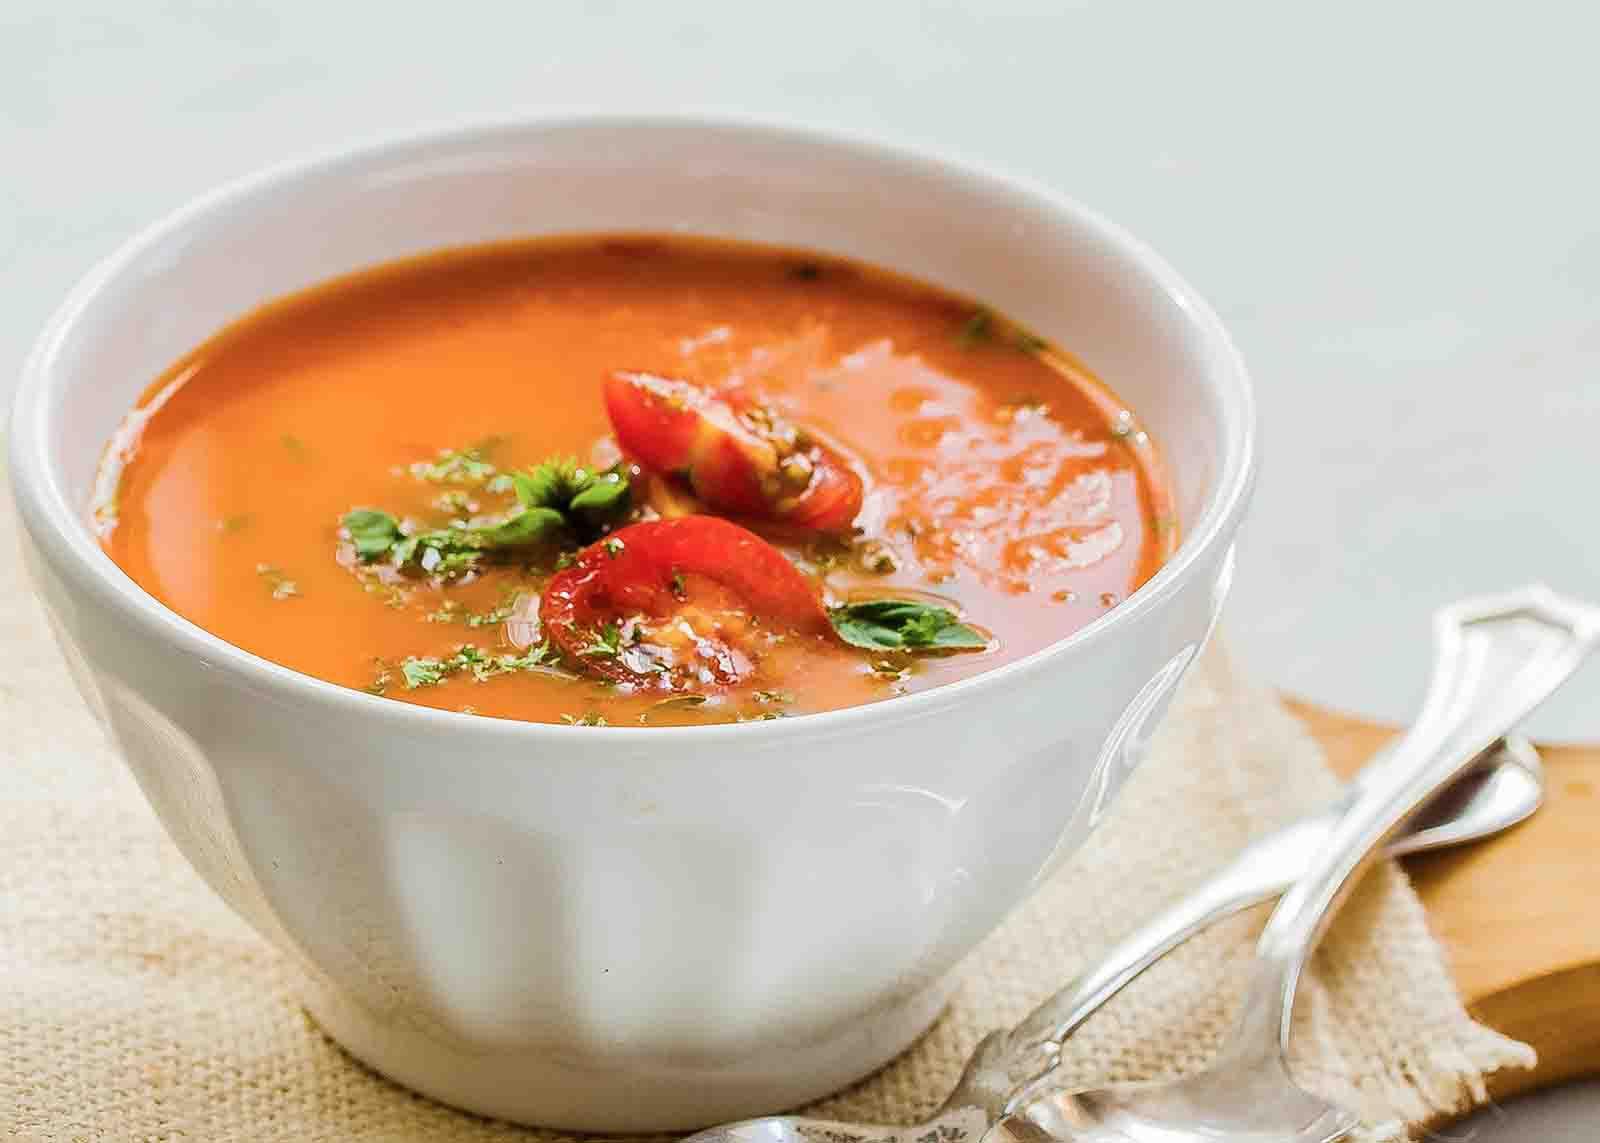 Creamy Tomato and Bean Soup